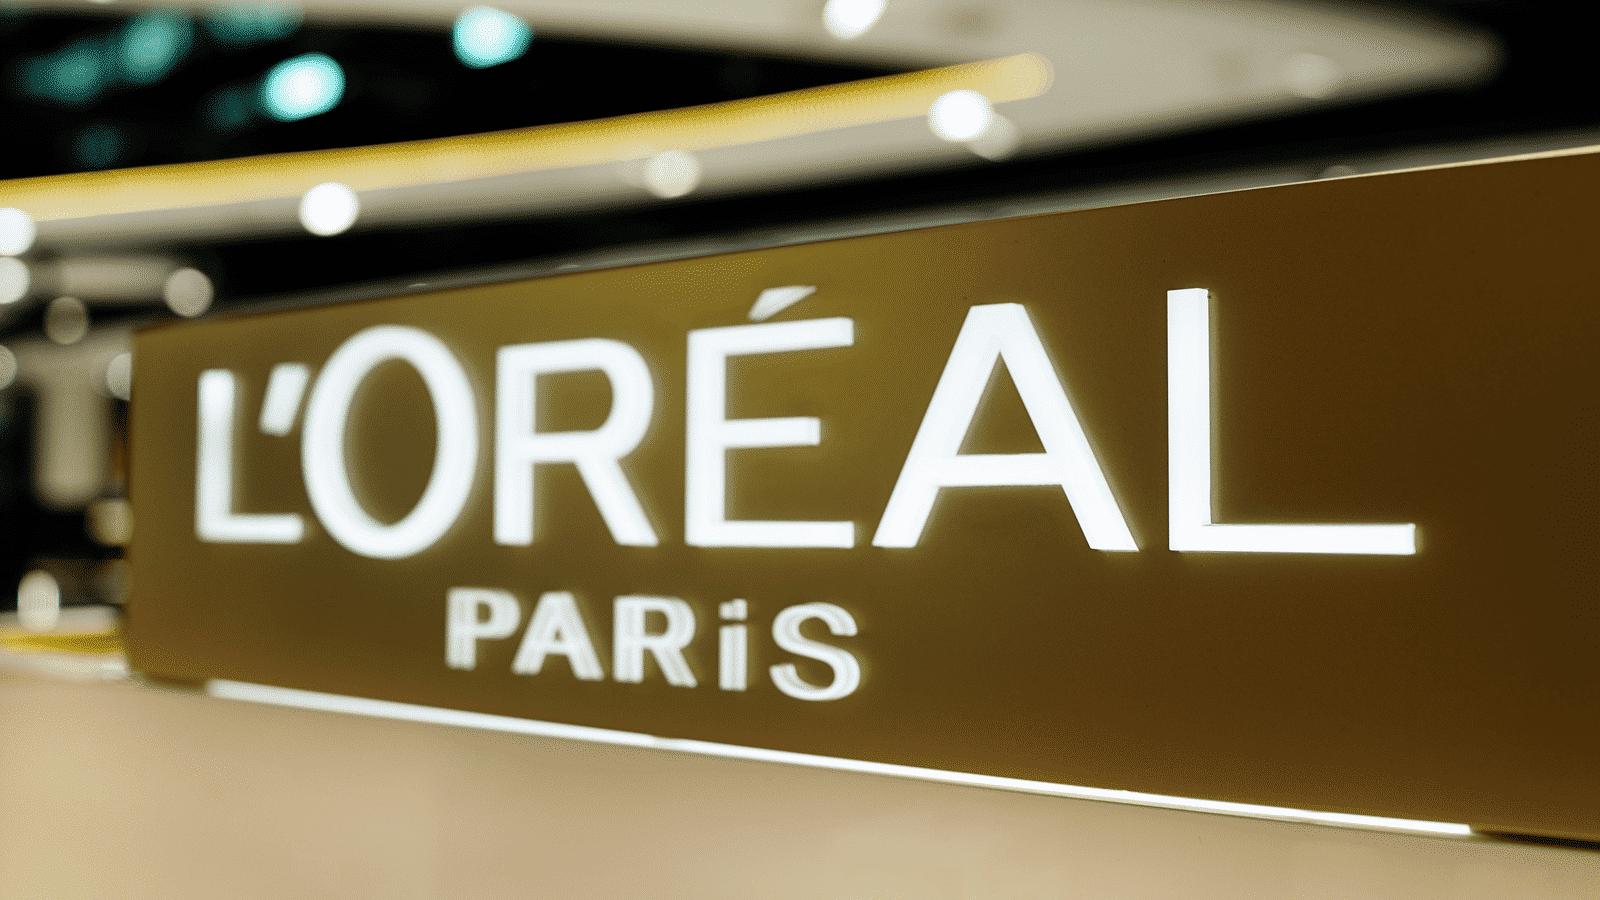 L'Oréal Sued for Racial Discrimination & Toxic Work Environment